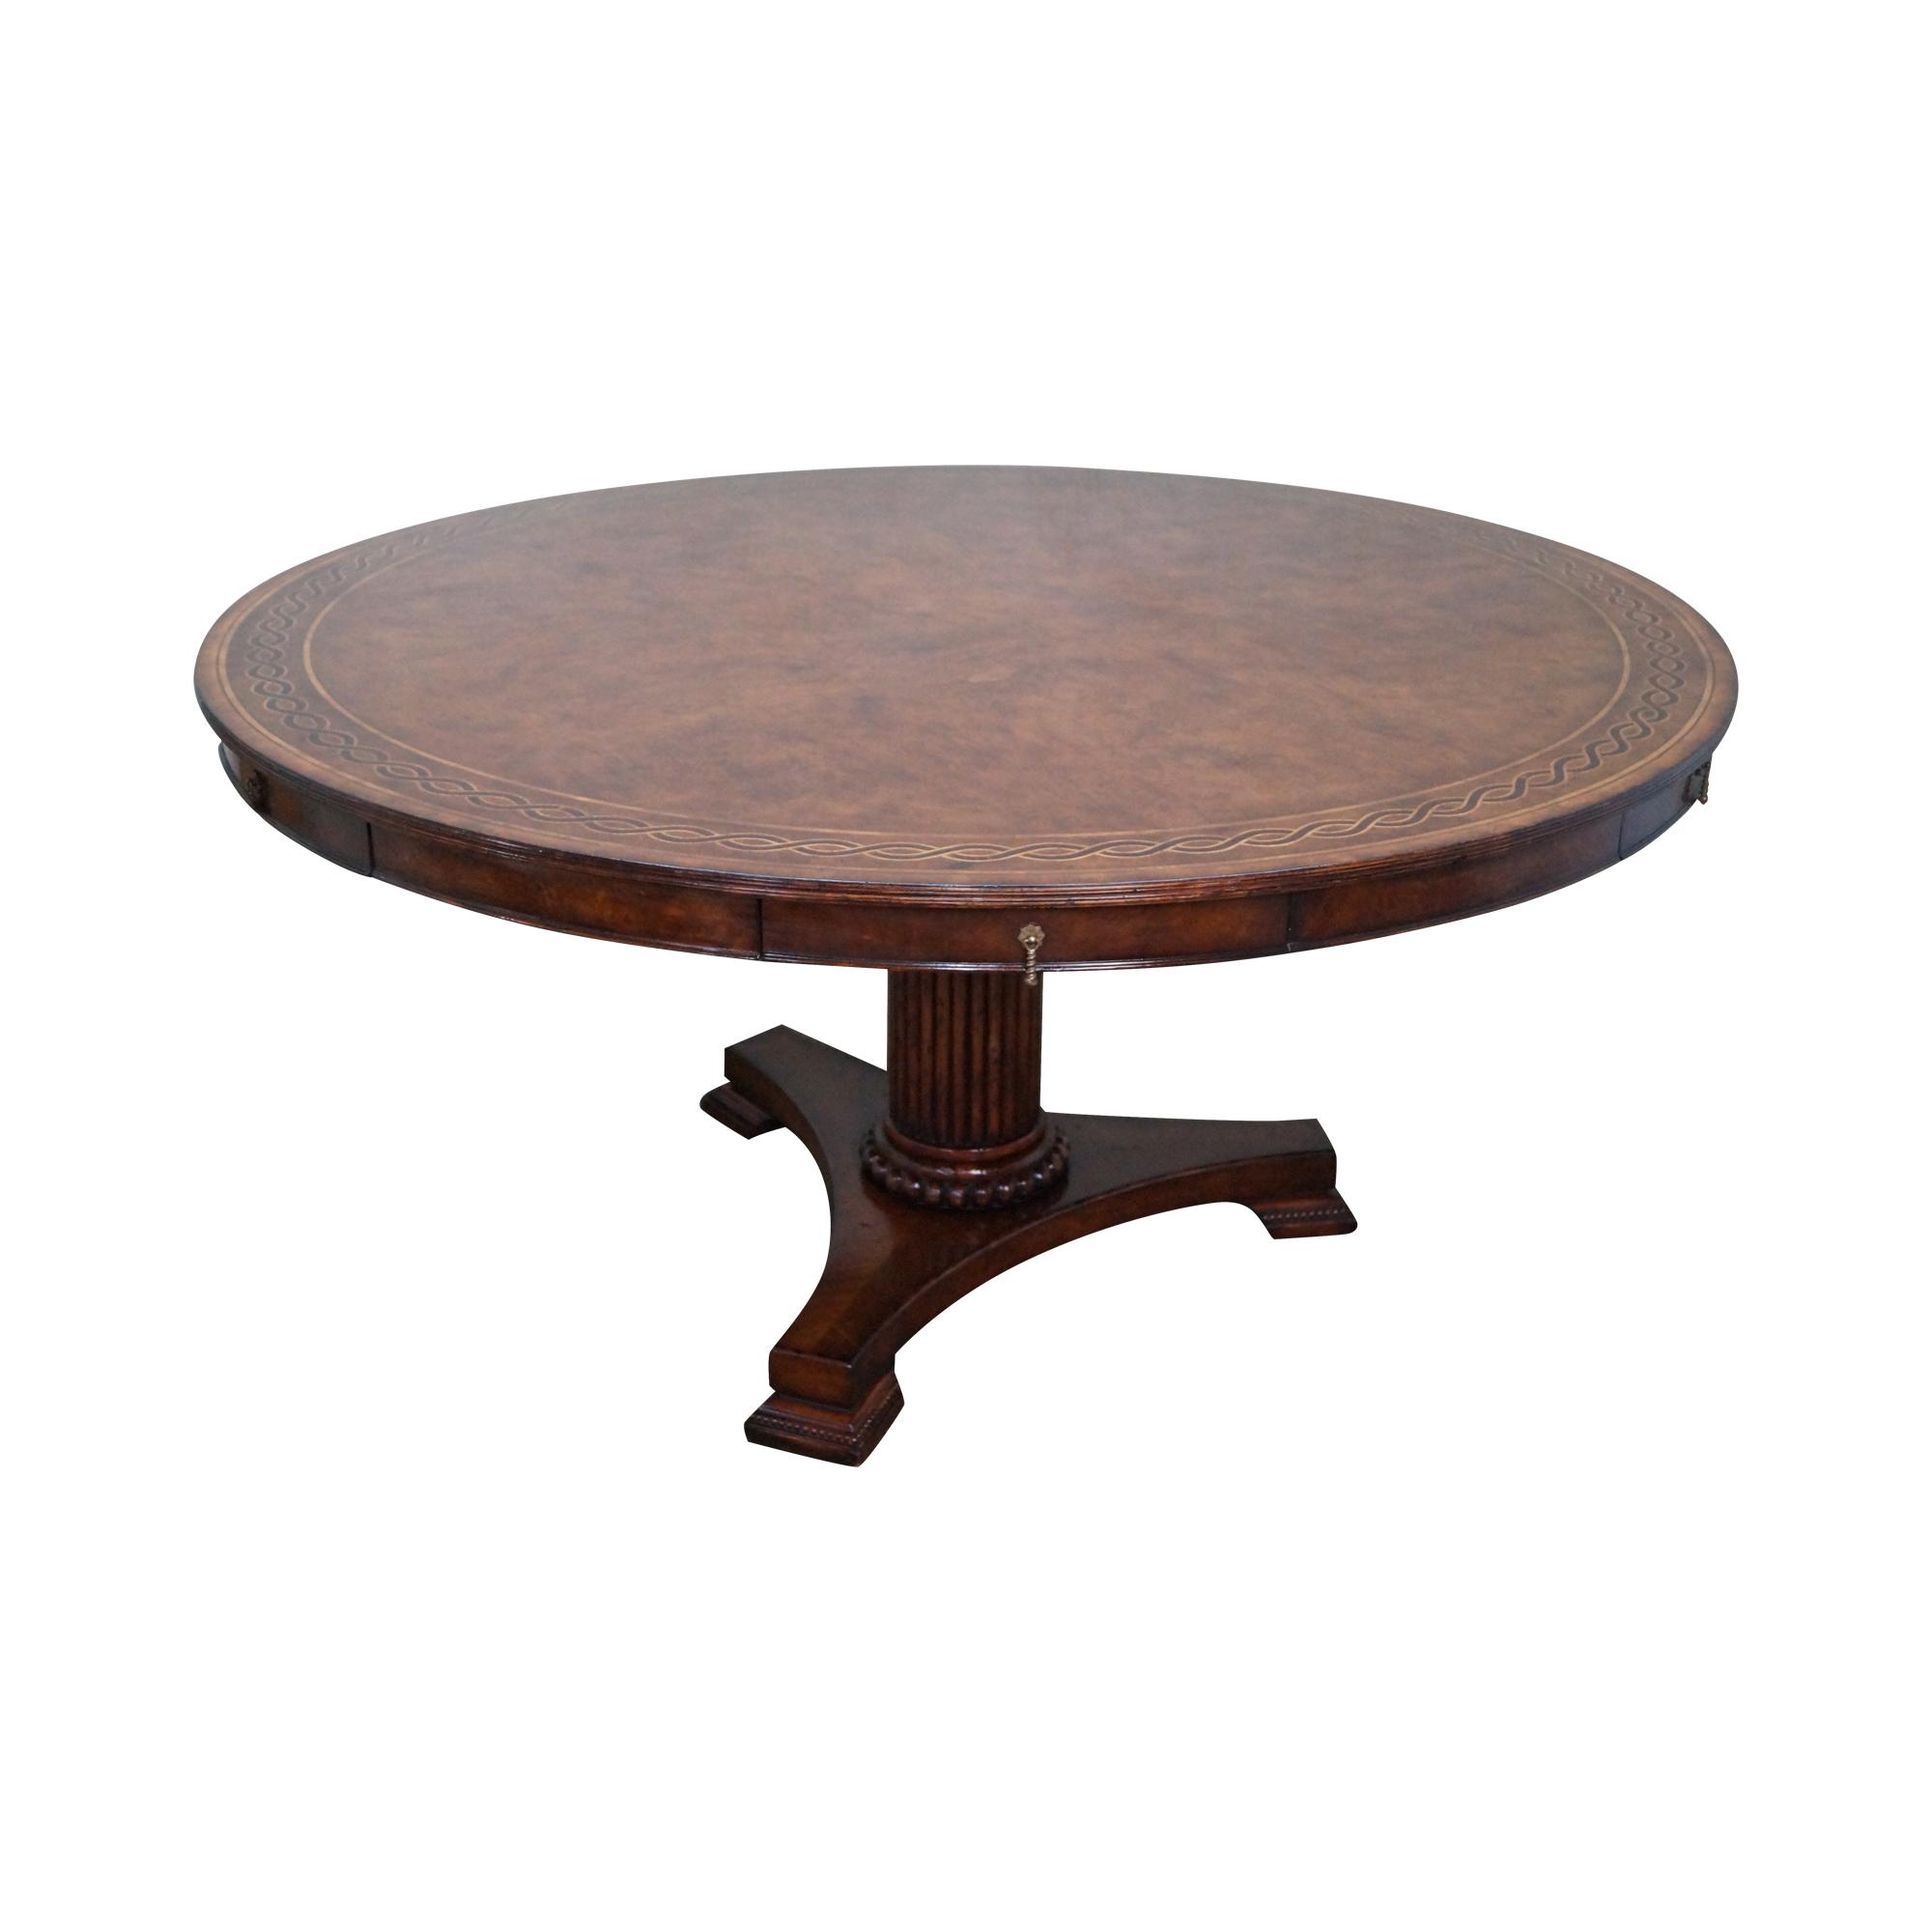 Jonathan Charles Burl Wood Pedestal Dining Table Chairish